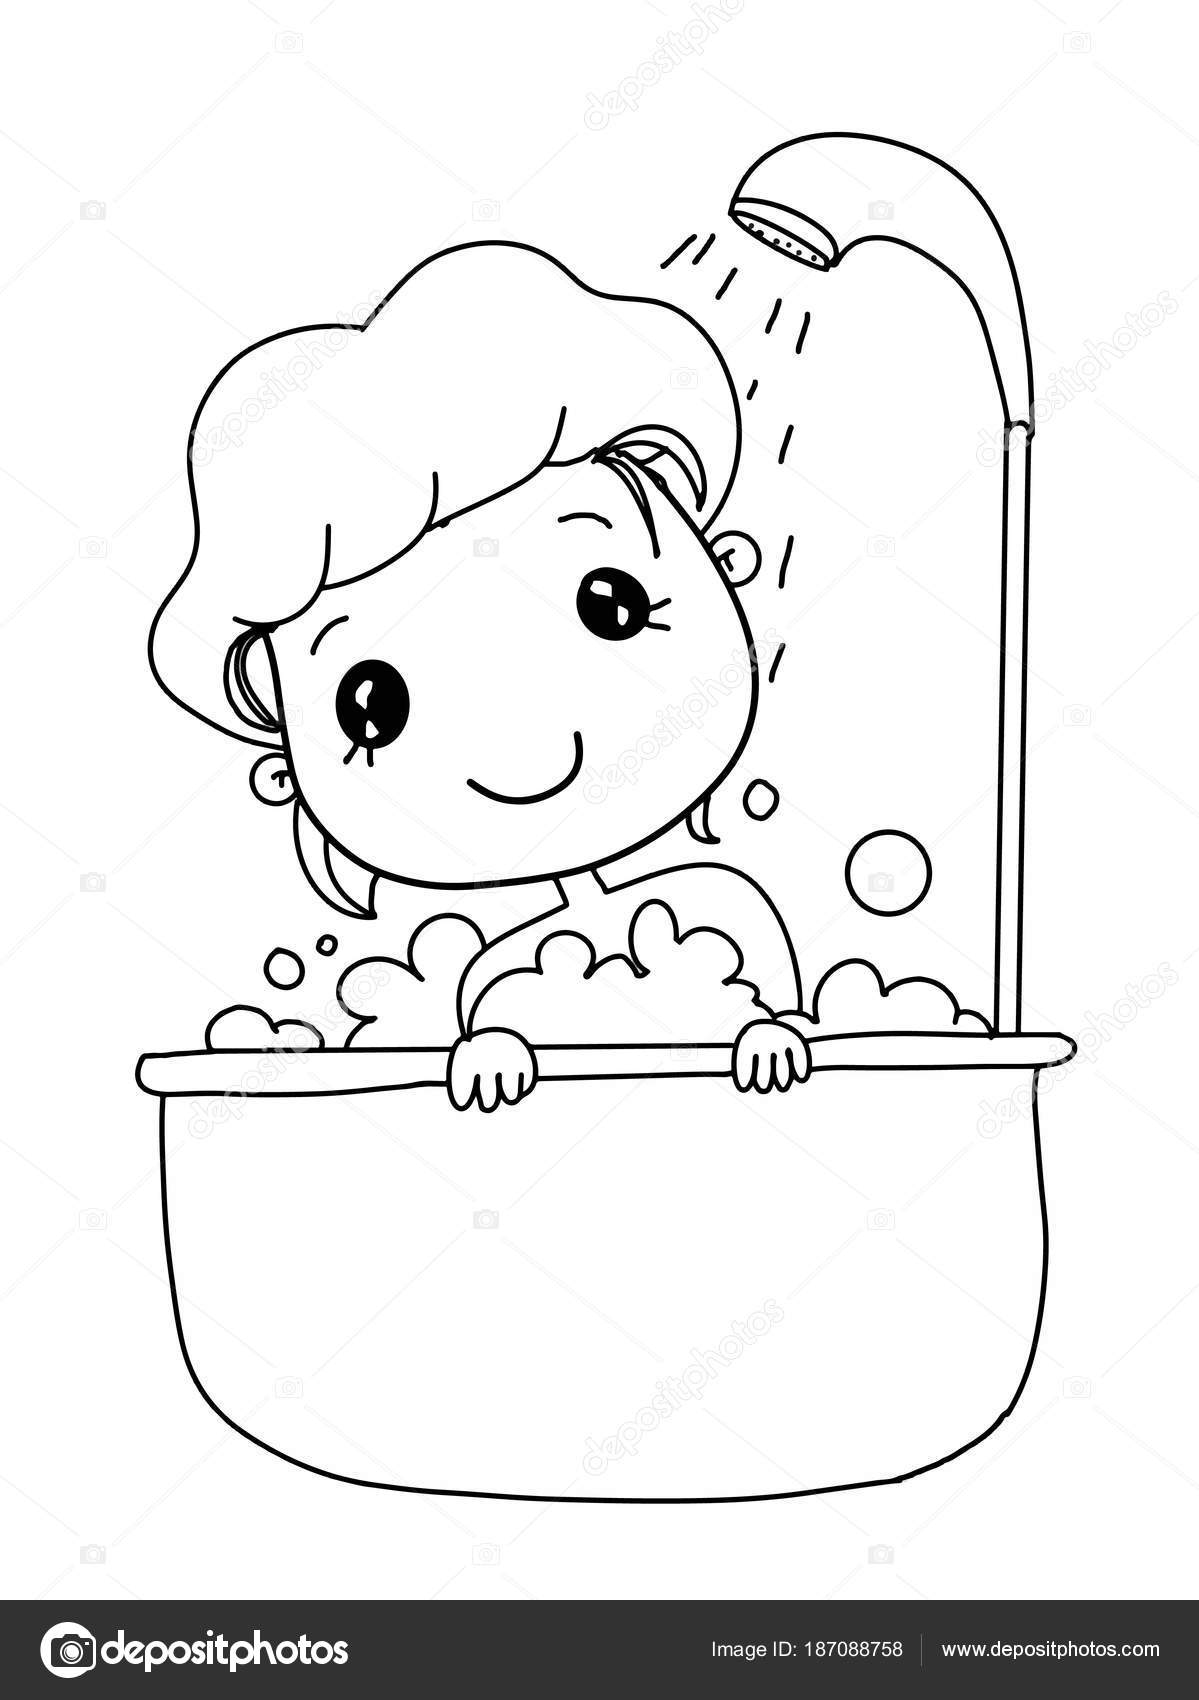 Bañarse Dibujo Infantil Chica Niño Dibujos Animados Lindo